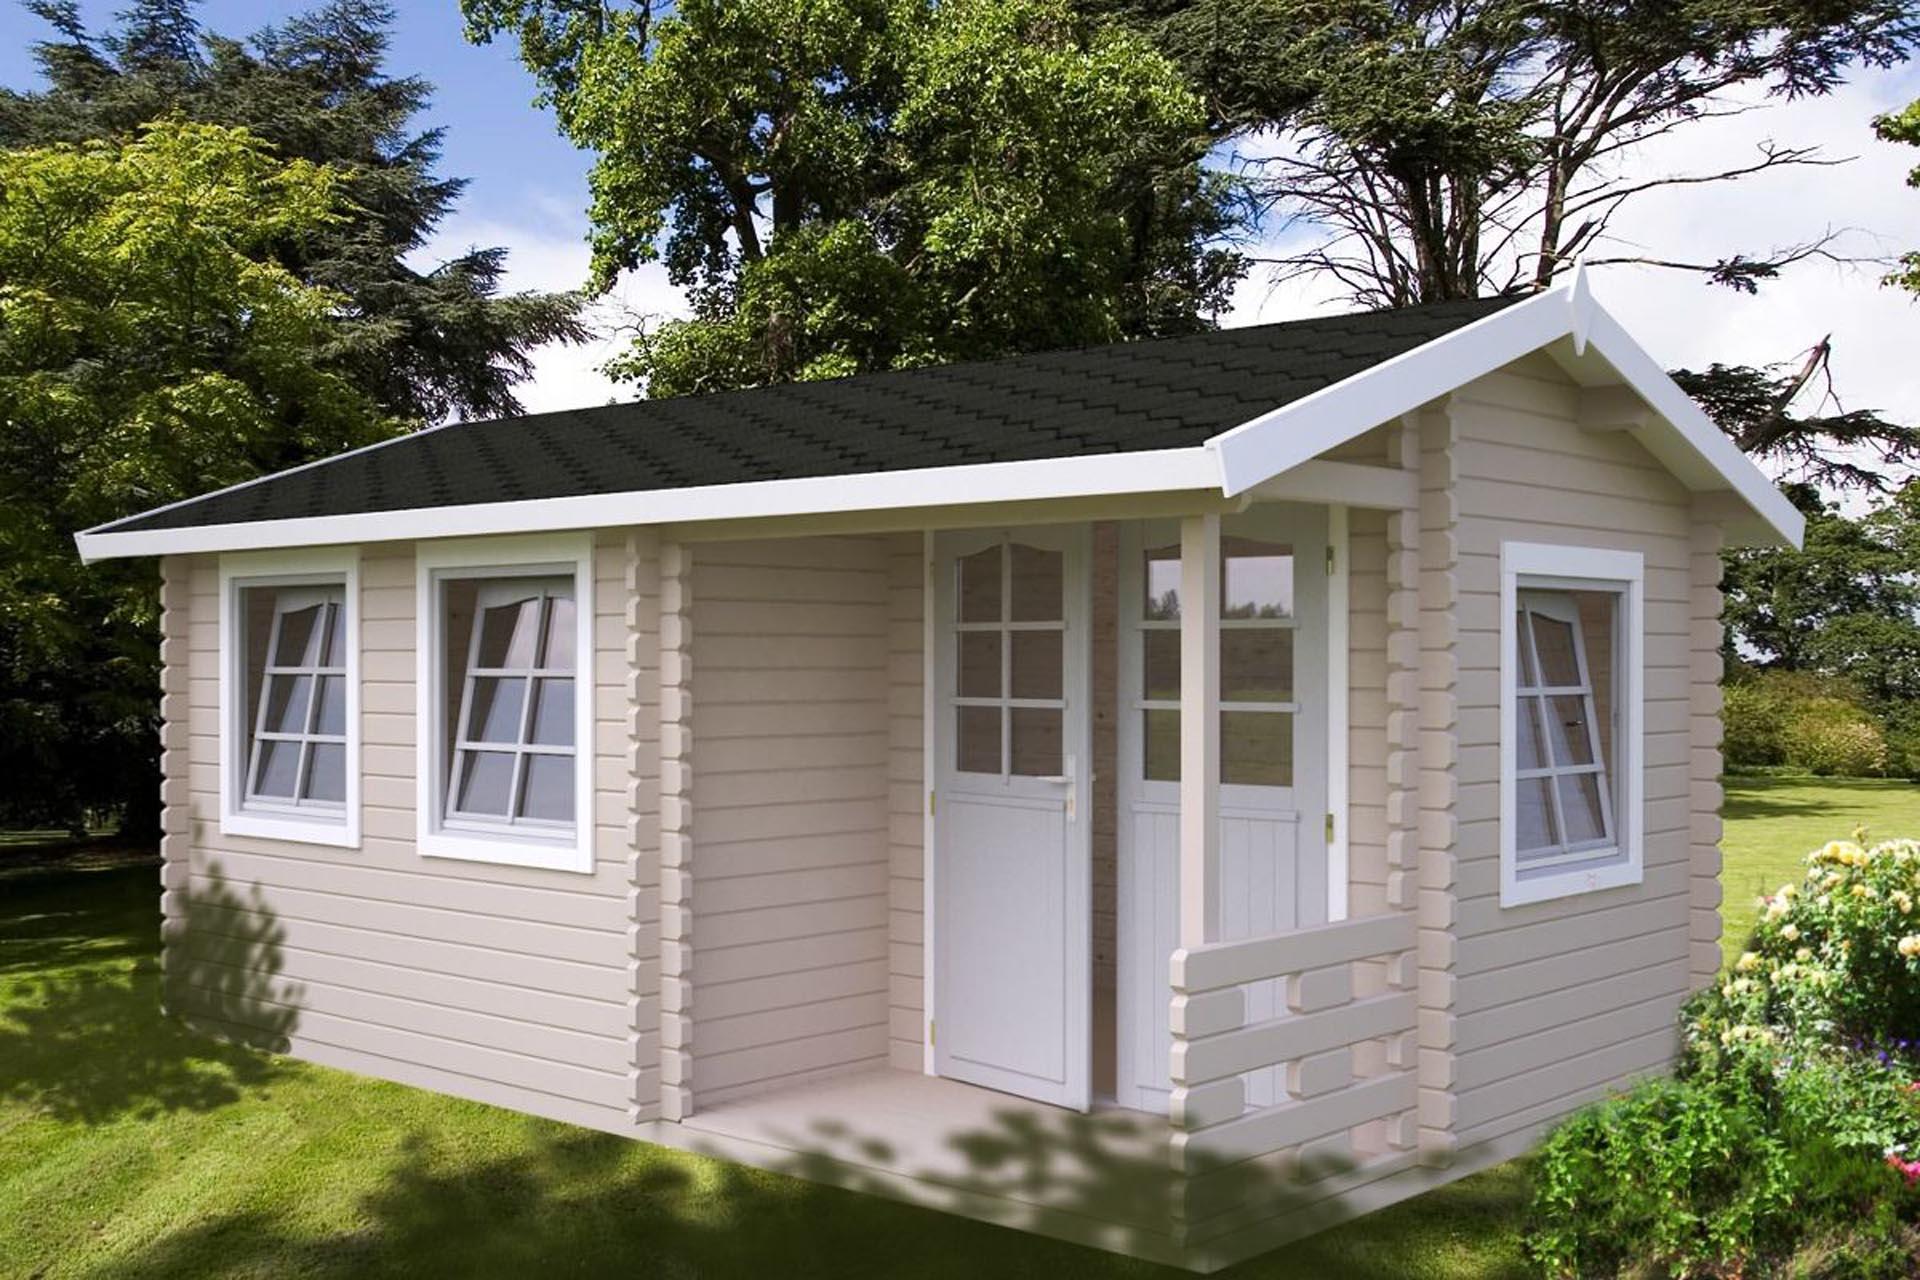 S lund susanne 12 4m2 et elegant hus til kolonihave du for Casas de madera jardin baratas